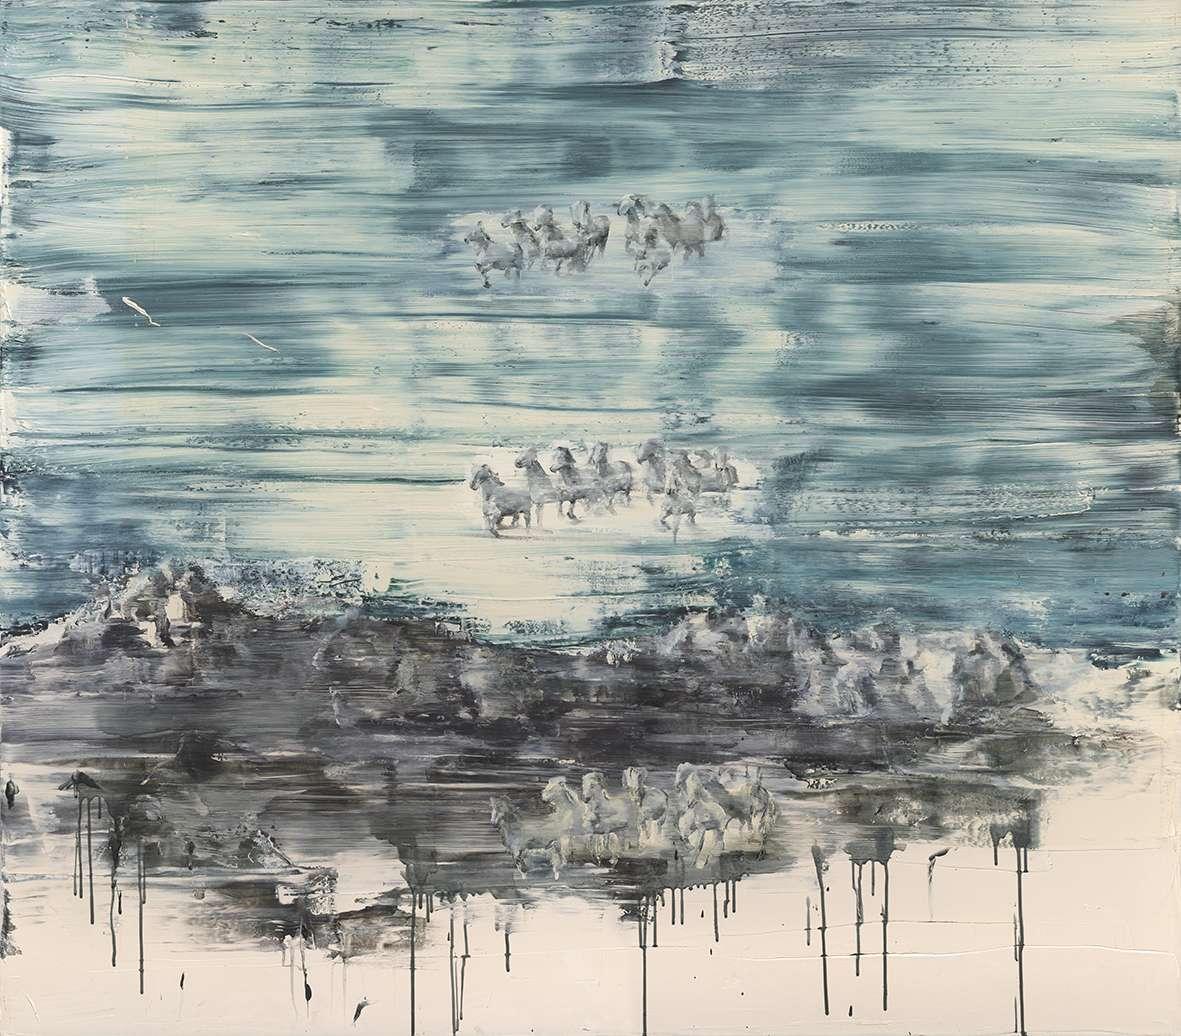 Tu Xi 涂曦, Spiral 螺旋上升, 2013, Oil on canvas 布面油画, 150 x 180 cm